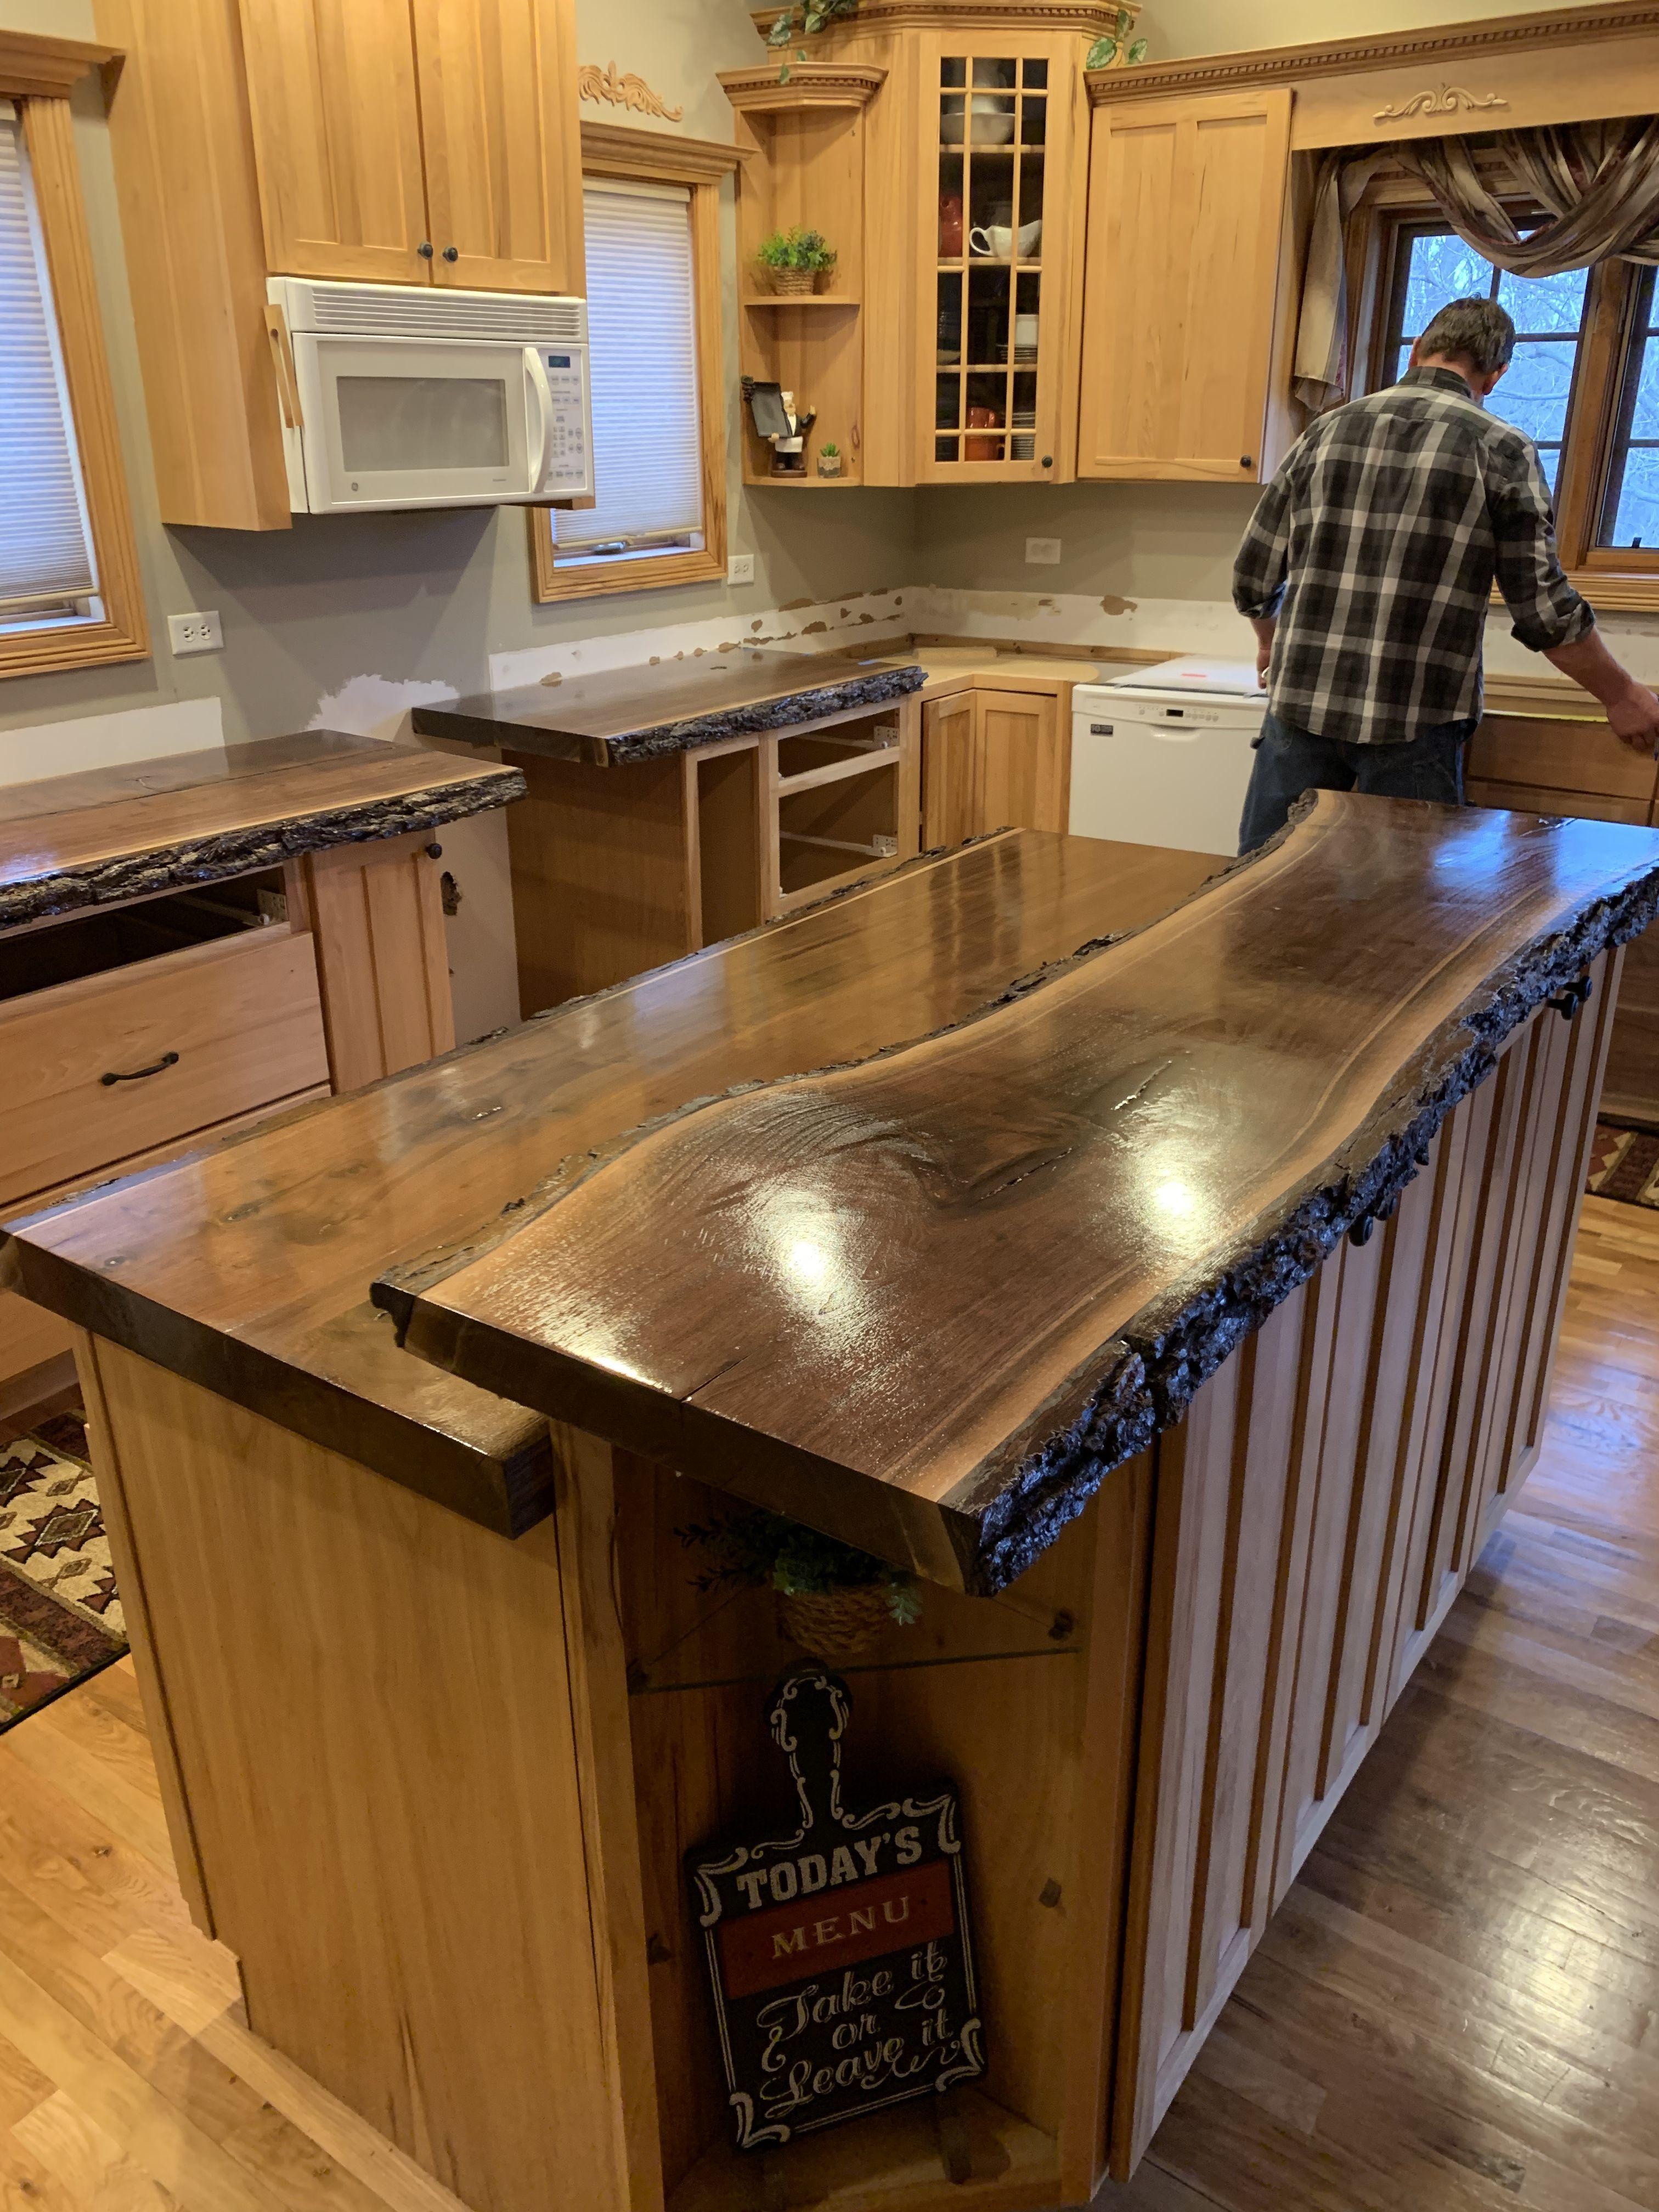 Live Edge Kitchen Countertop With Bark 2 1 2 Rdquo Solid Walnut